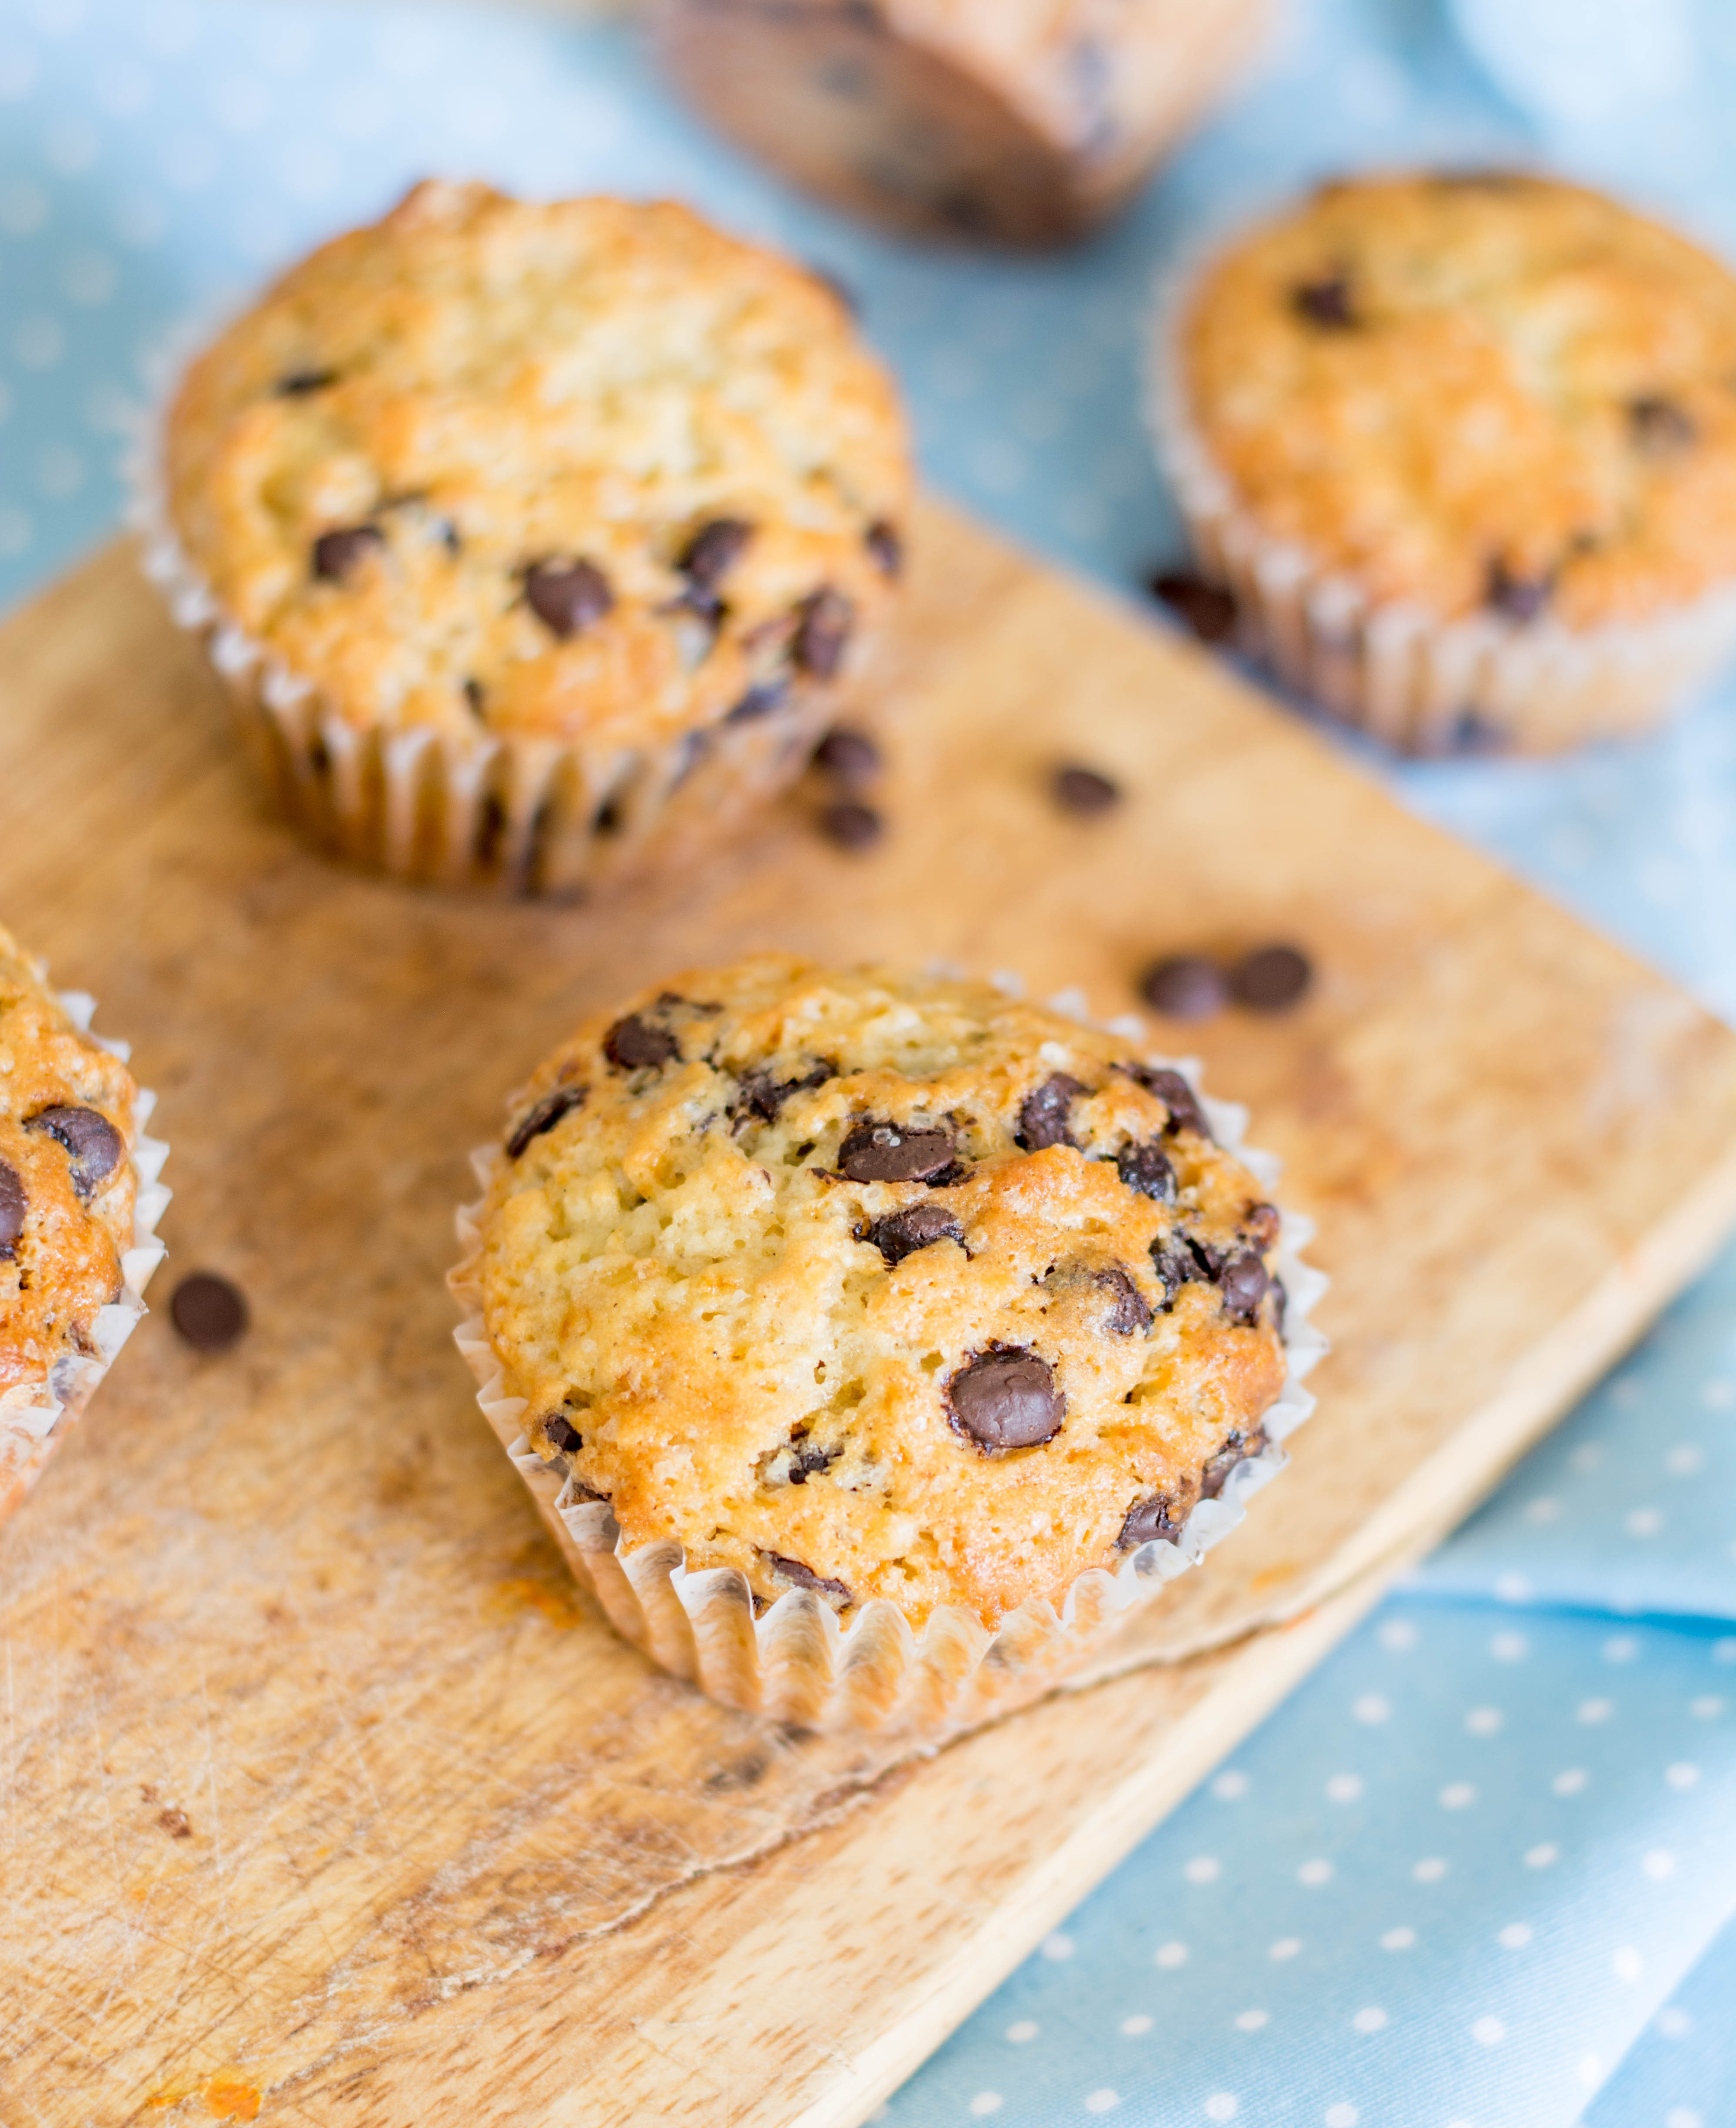 how to make chocolate chocolate chip muffins